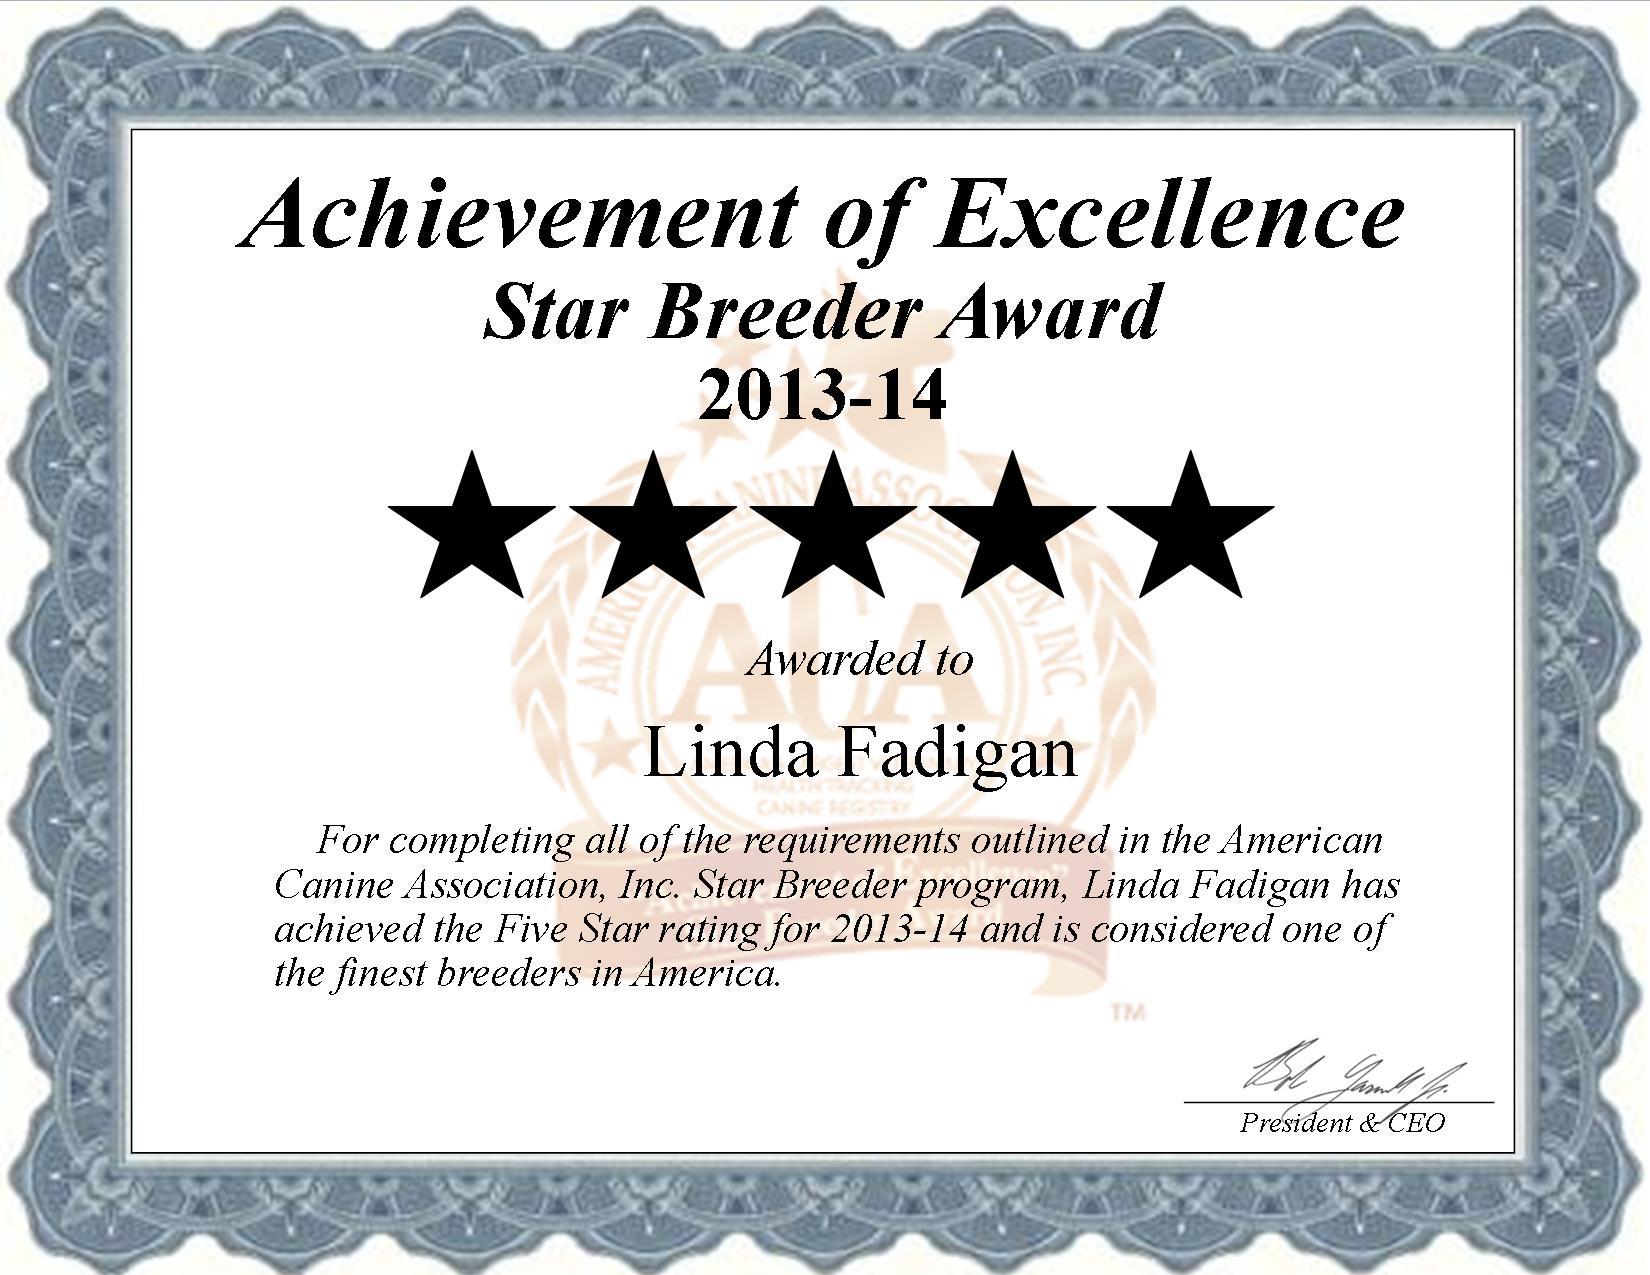 Linda, Fadigan,Linda Fadigan, Fadigan Kennel, breeder, star breeder, aca, star breeder, 5 star, ketchum, oklahoma, ok, dog, puppy, puppies, dog breeder, dog breeders, Pennsylvania breeder,Linda Fadigan dog breeder, Jo-Lin, Jo-lin kennel